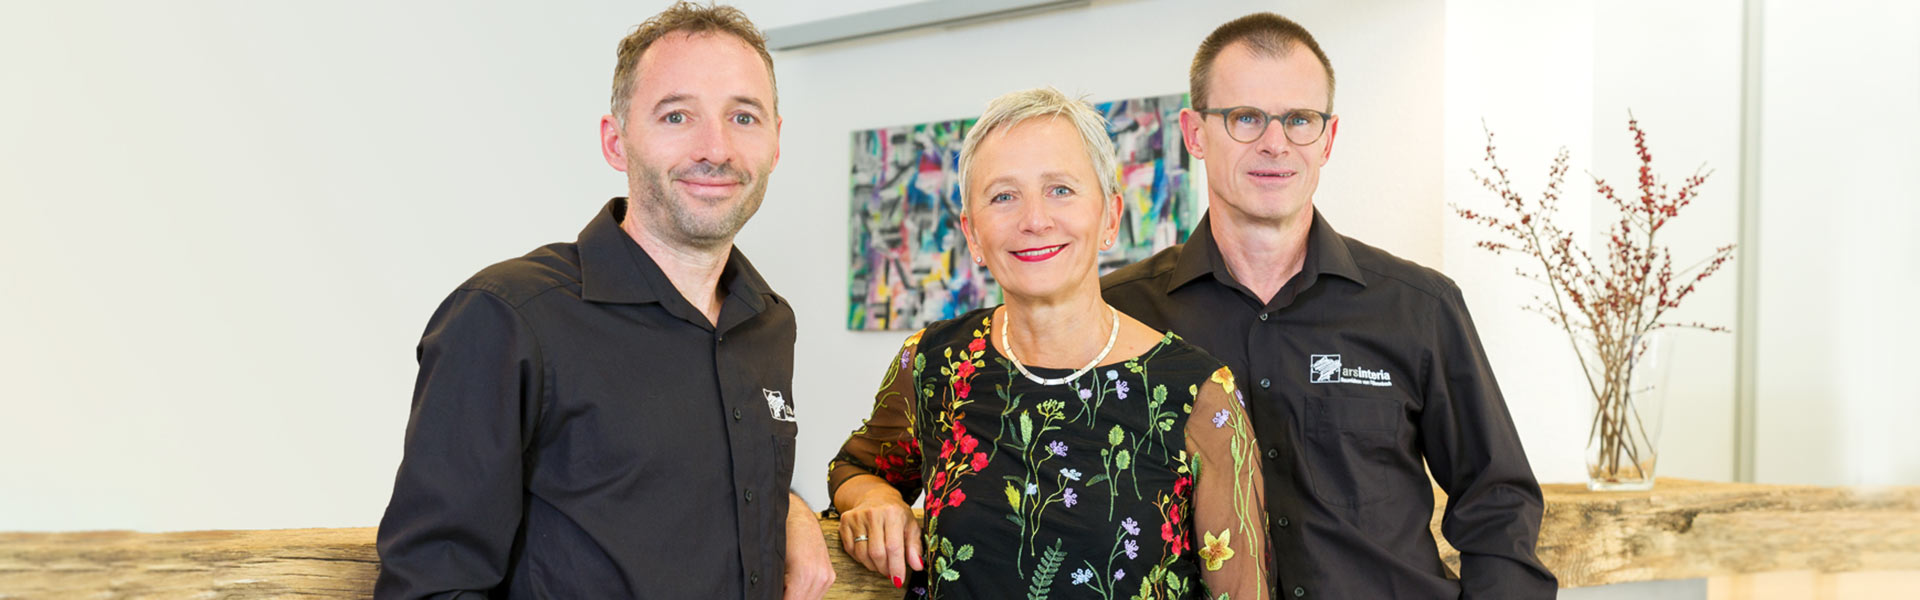 Thomas Schuler, Ingrid Föhrenbach und Christoph Föhrenbach